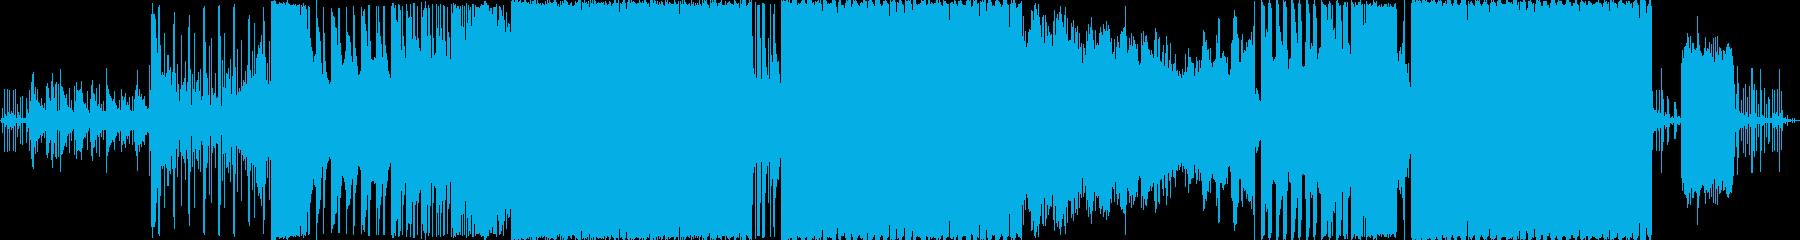 EDMなパッヘルベルのカノンの再生済みの波形